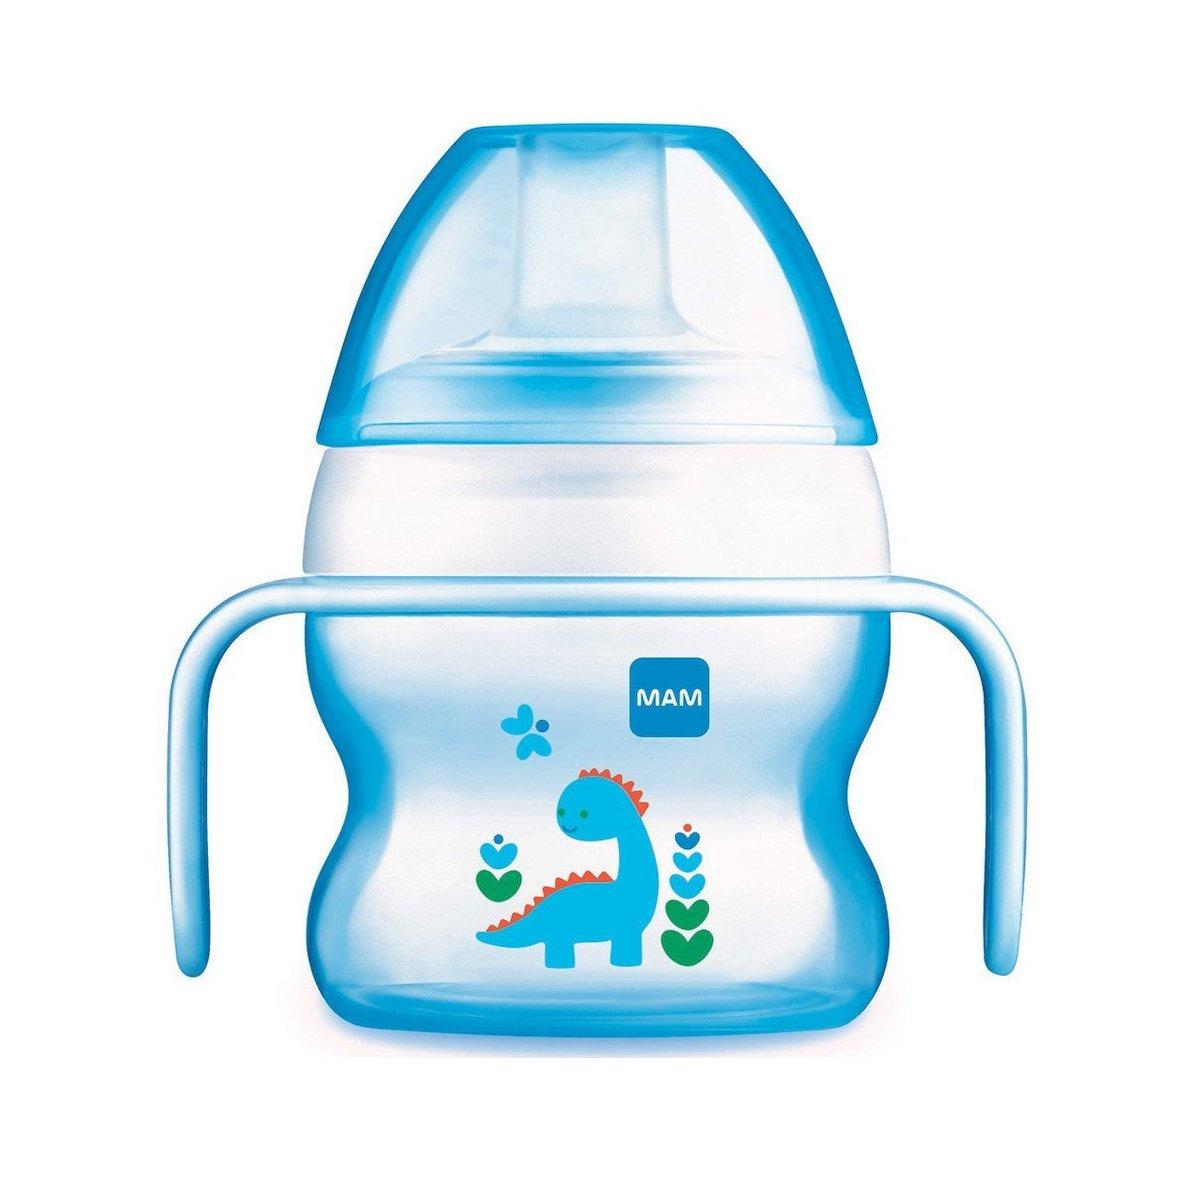 Mam Starter Cup Κωδ 462 Το Πρώτο Ποτηράκι του Μωρού, με Χερουλάκια για Αυτόνομο Κράτημα & Πολύ Μαλακό Στόμιο από 4+ Μηνών 150ml – μπλέ